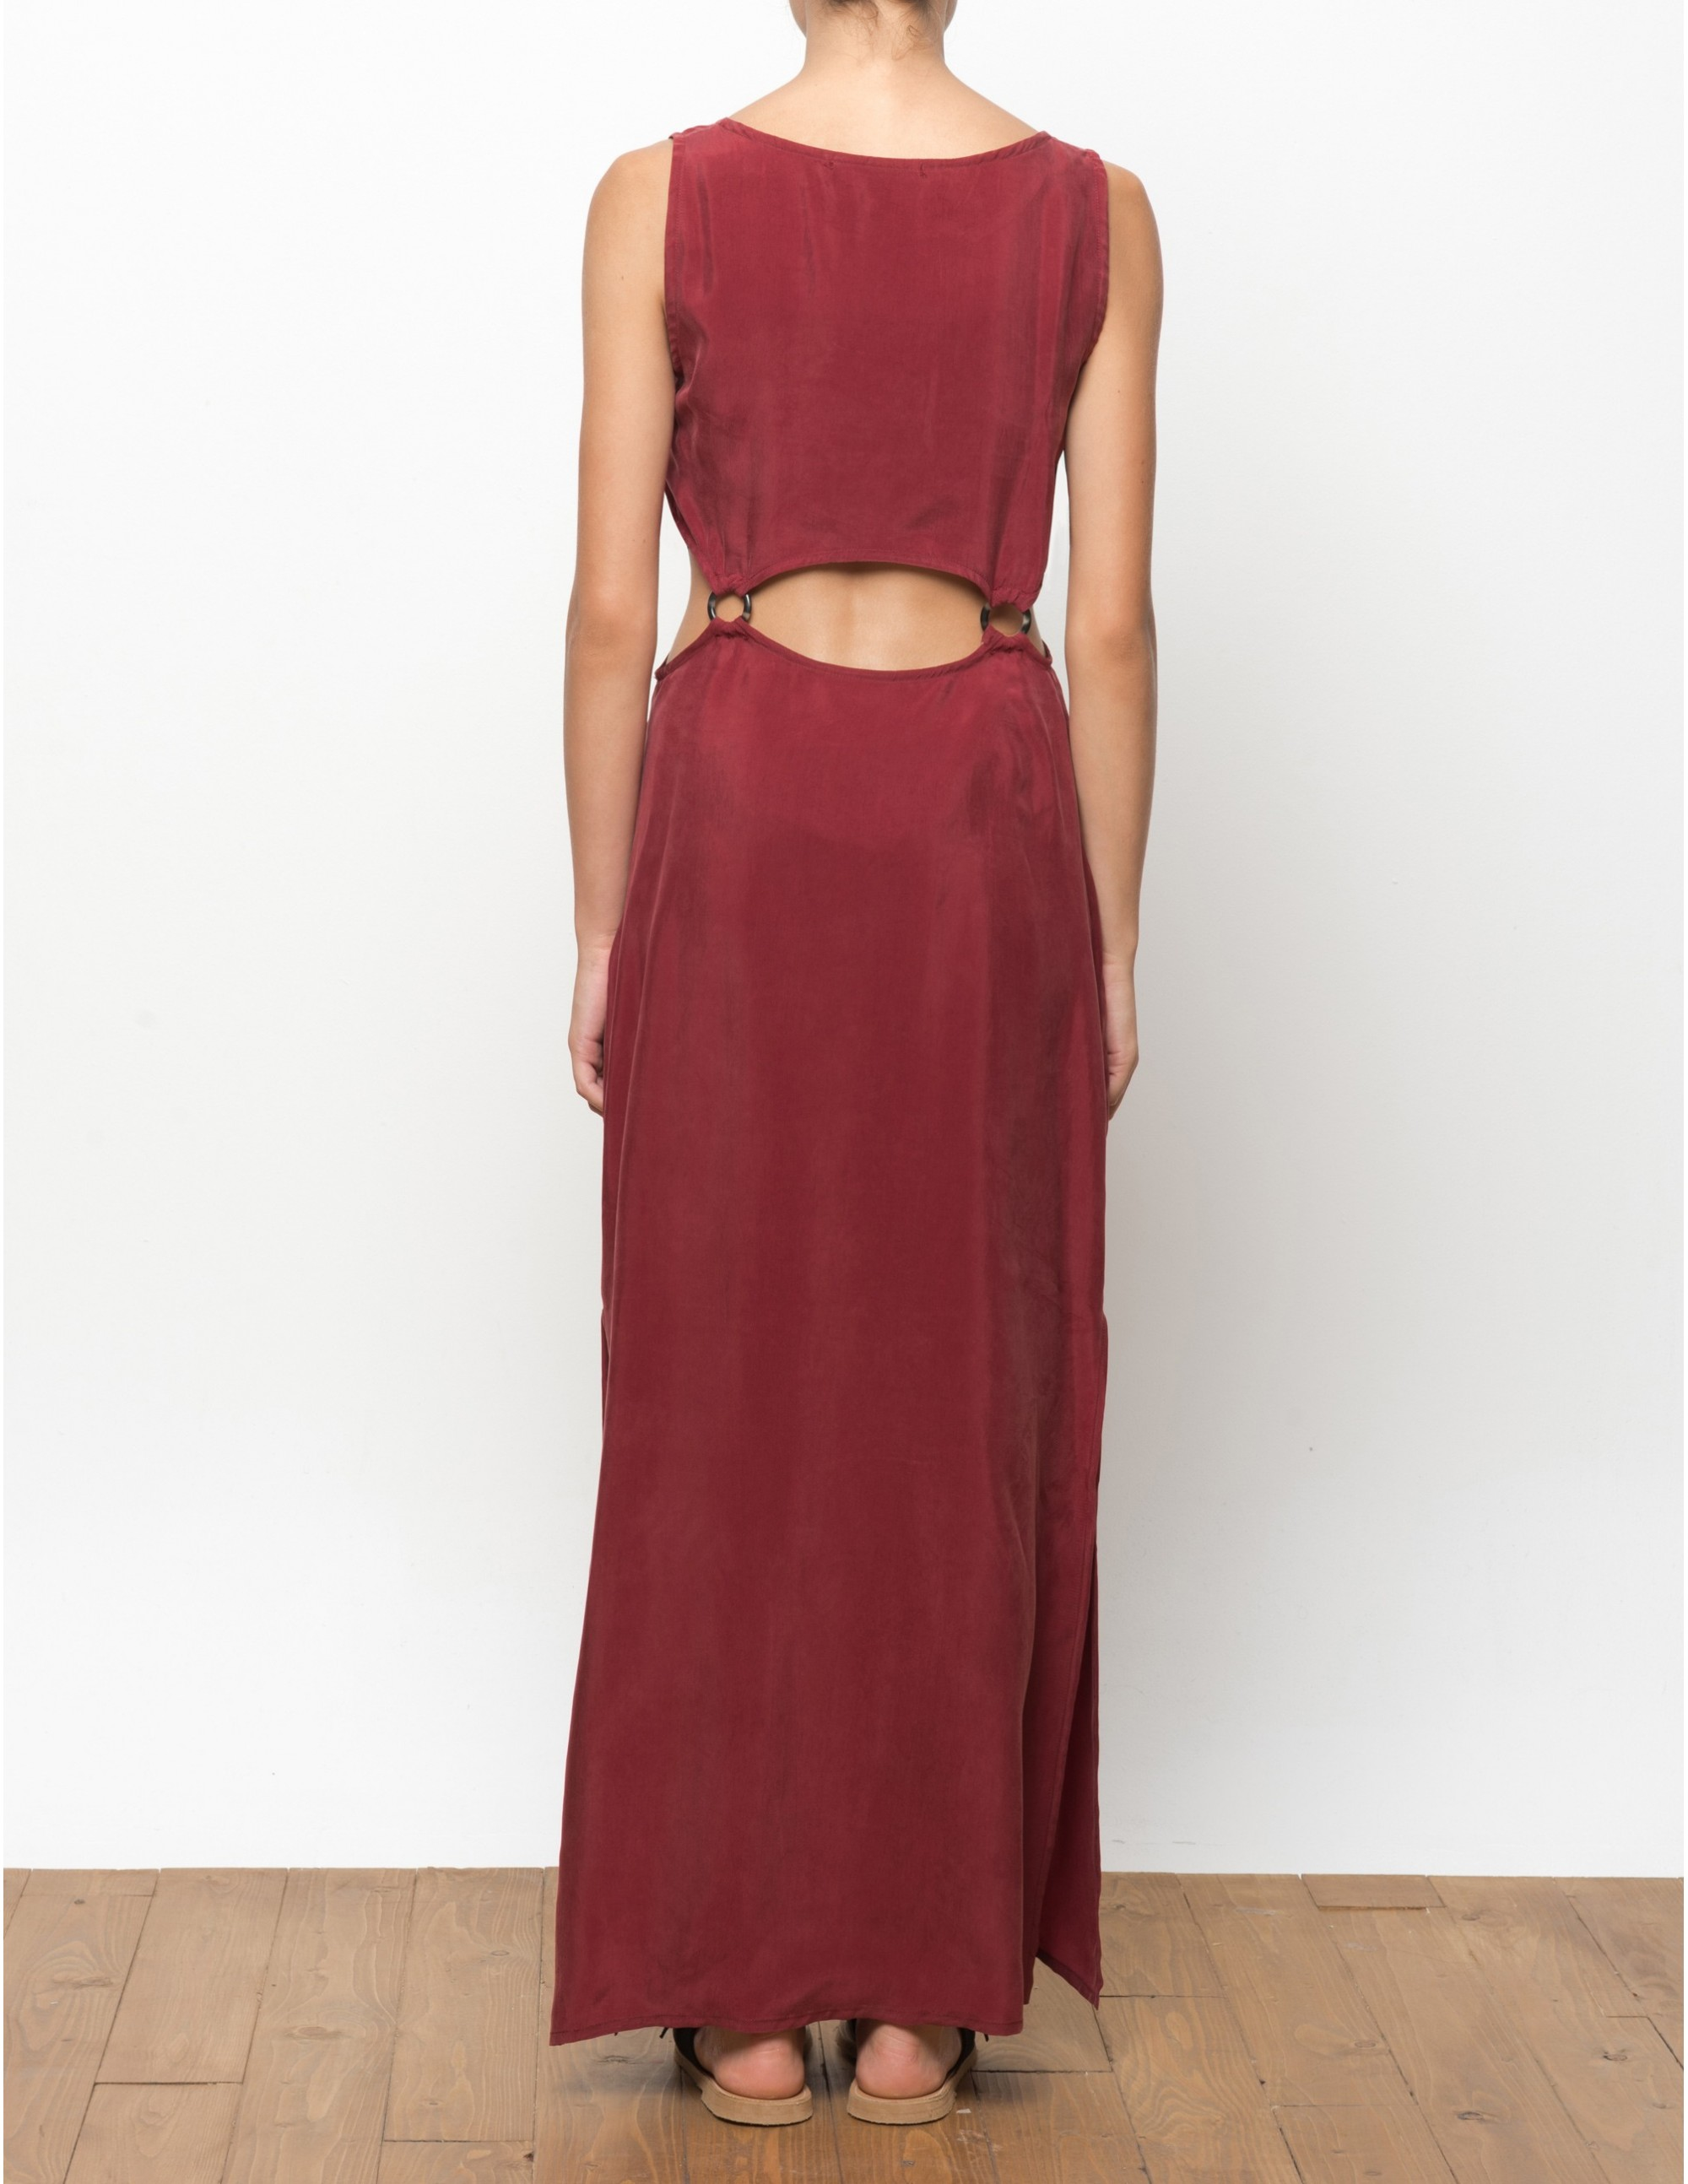 KILWA dress - MASAAI